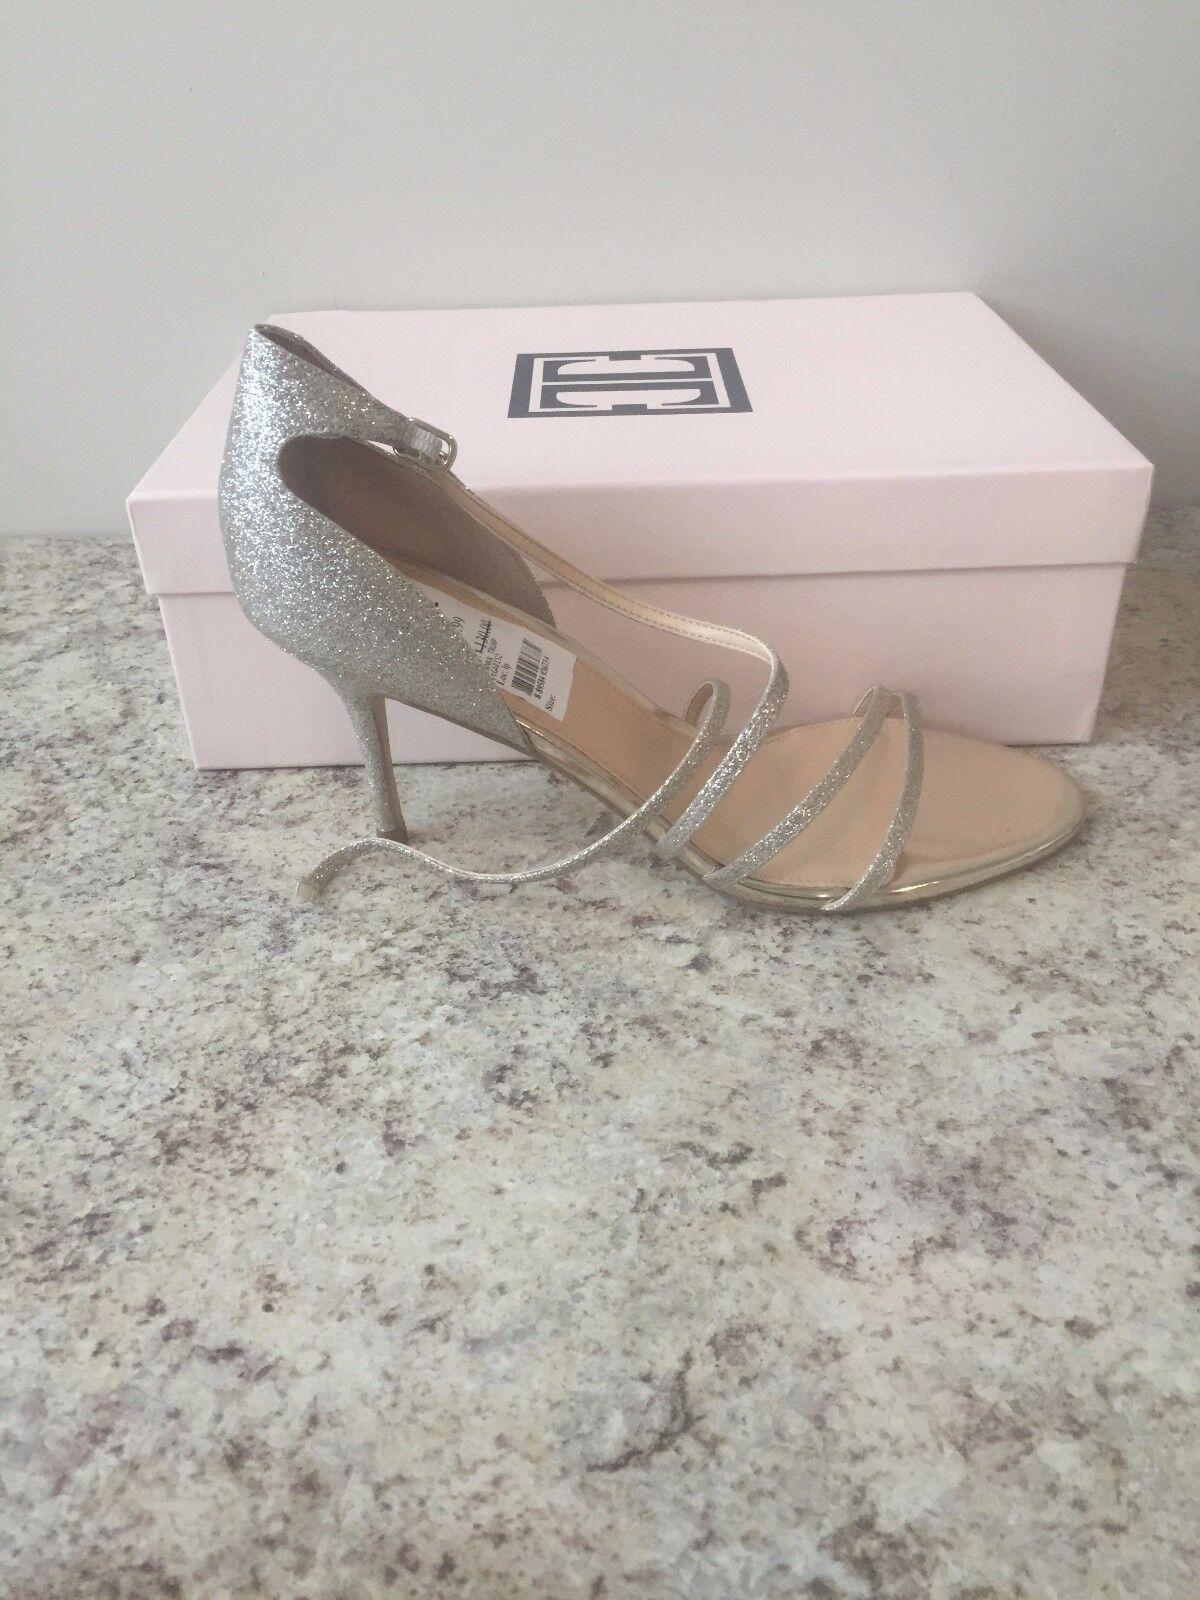 Zapatos para mujer-Ivanka Trump-Garis 2-tamaño 9.5M - NWB NWB - b68d4b